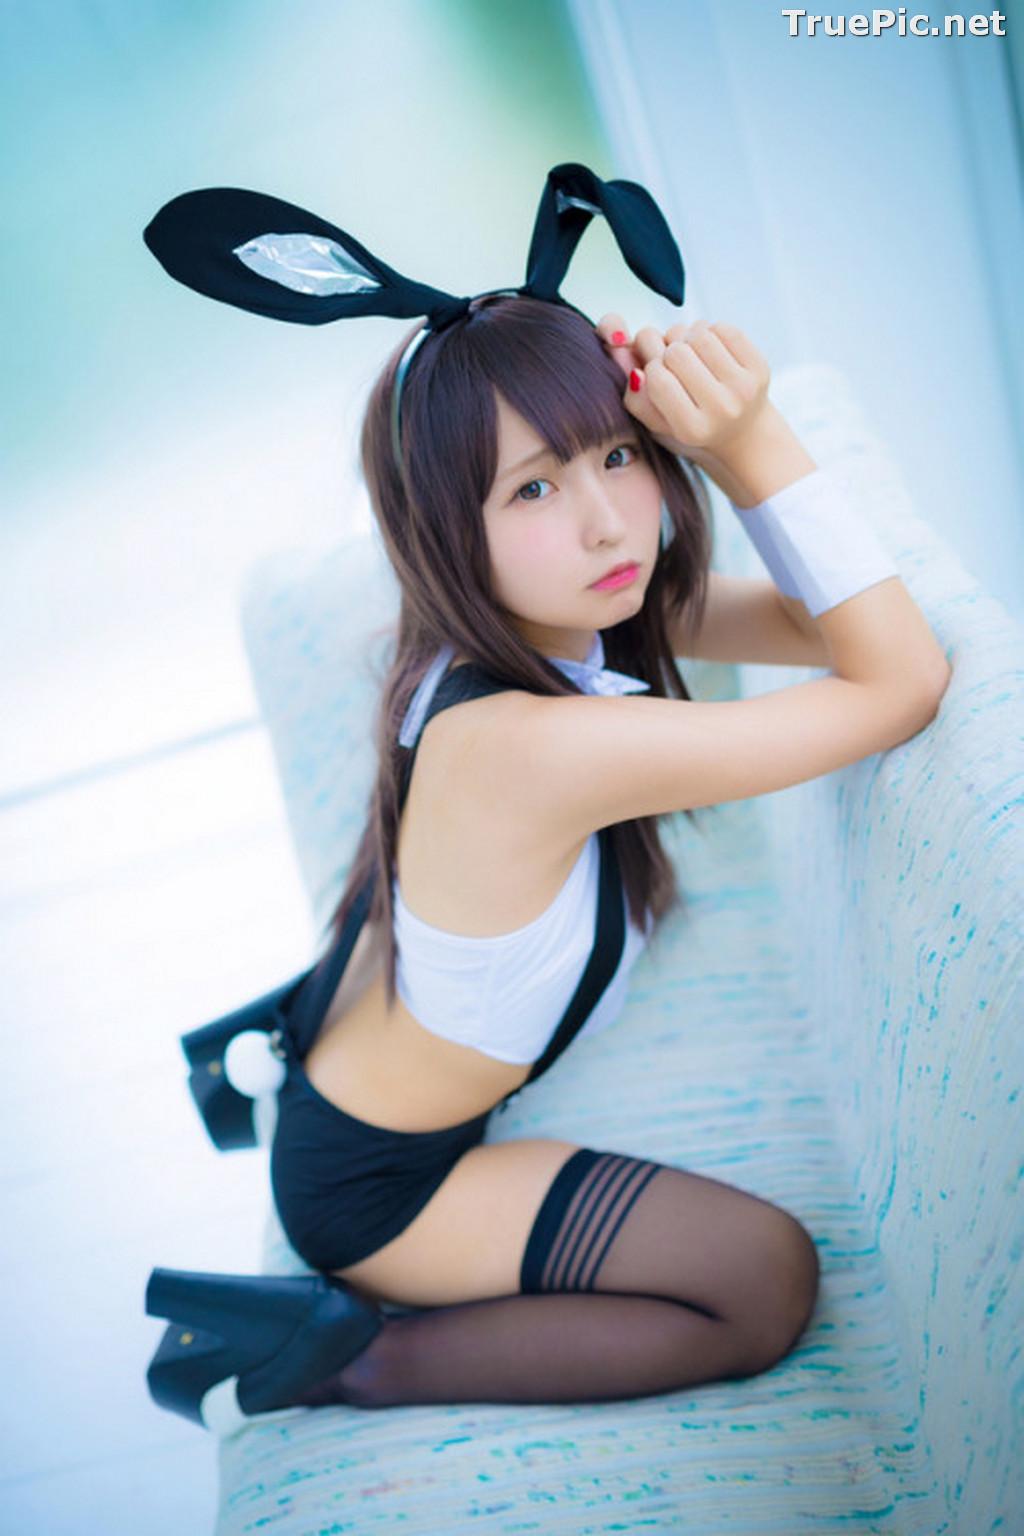 Image Japanese Model - Ennui Mamefu - Cute Cosplay Girl - TruePic.net - Picture-7